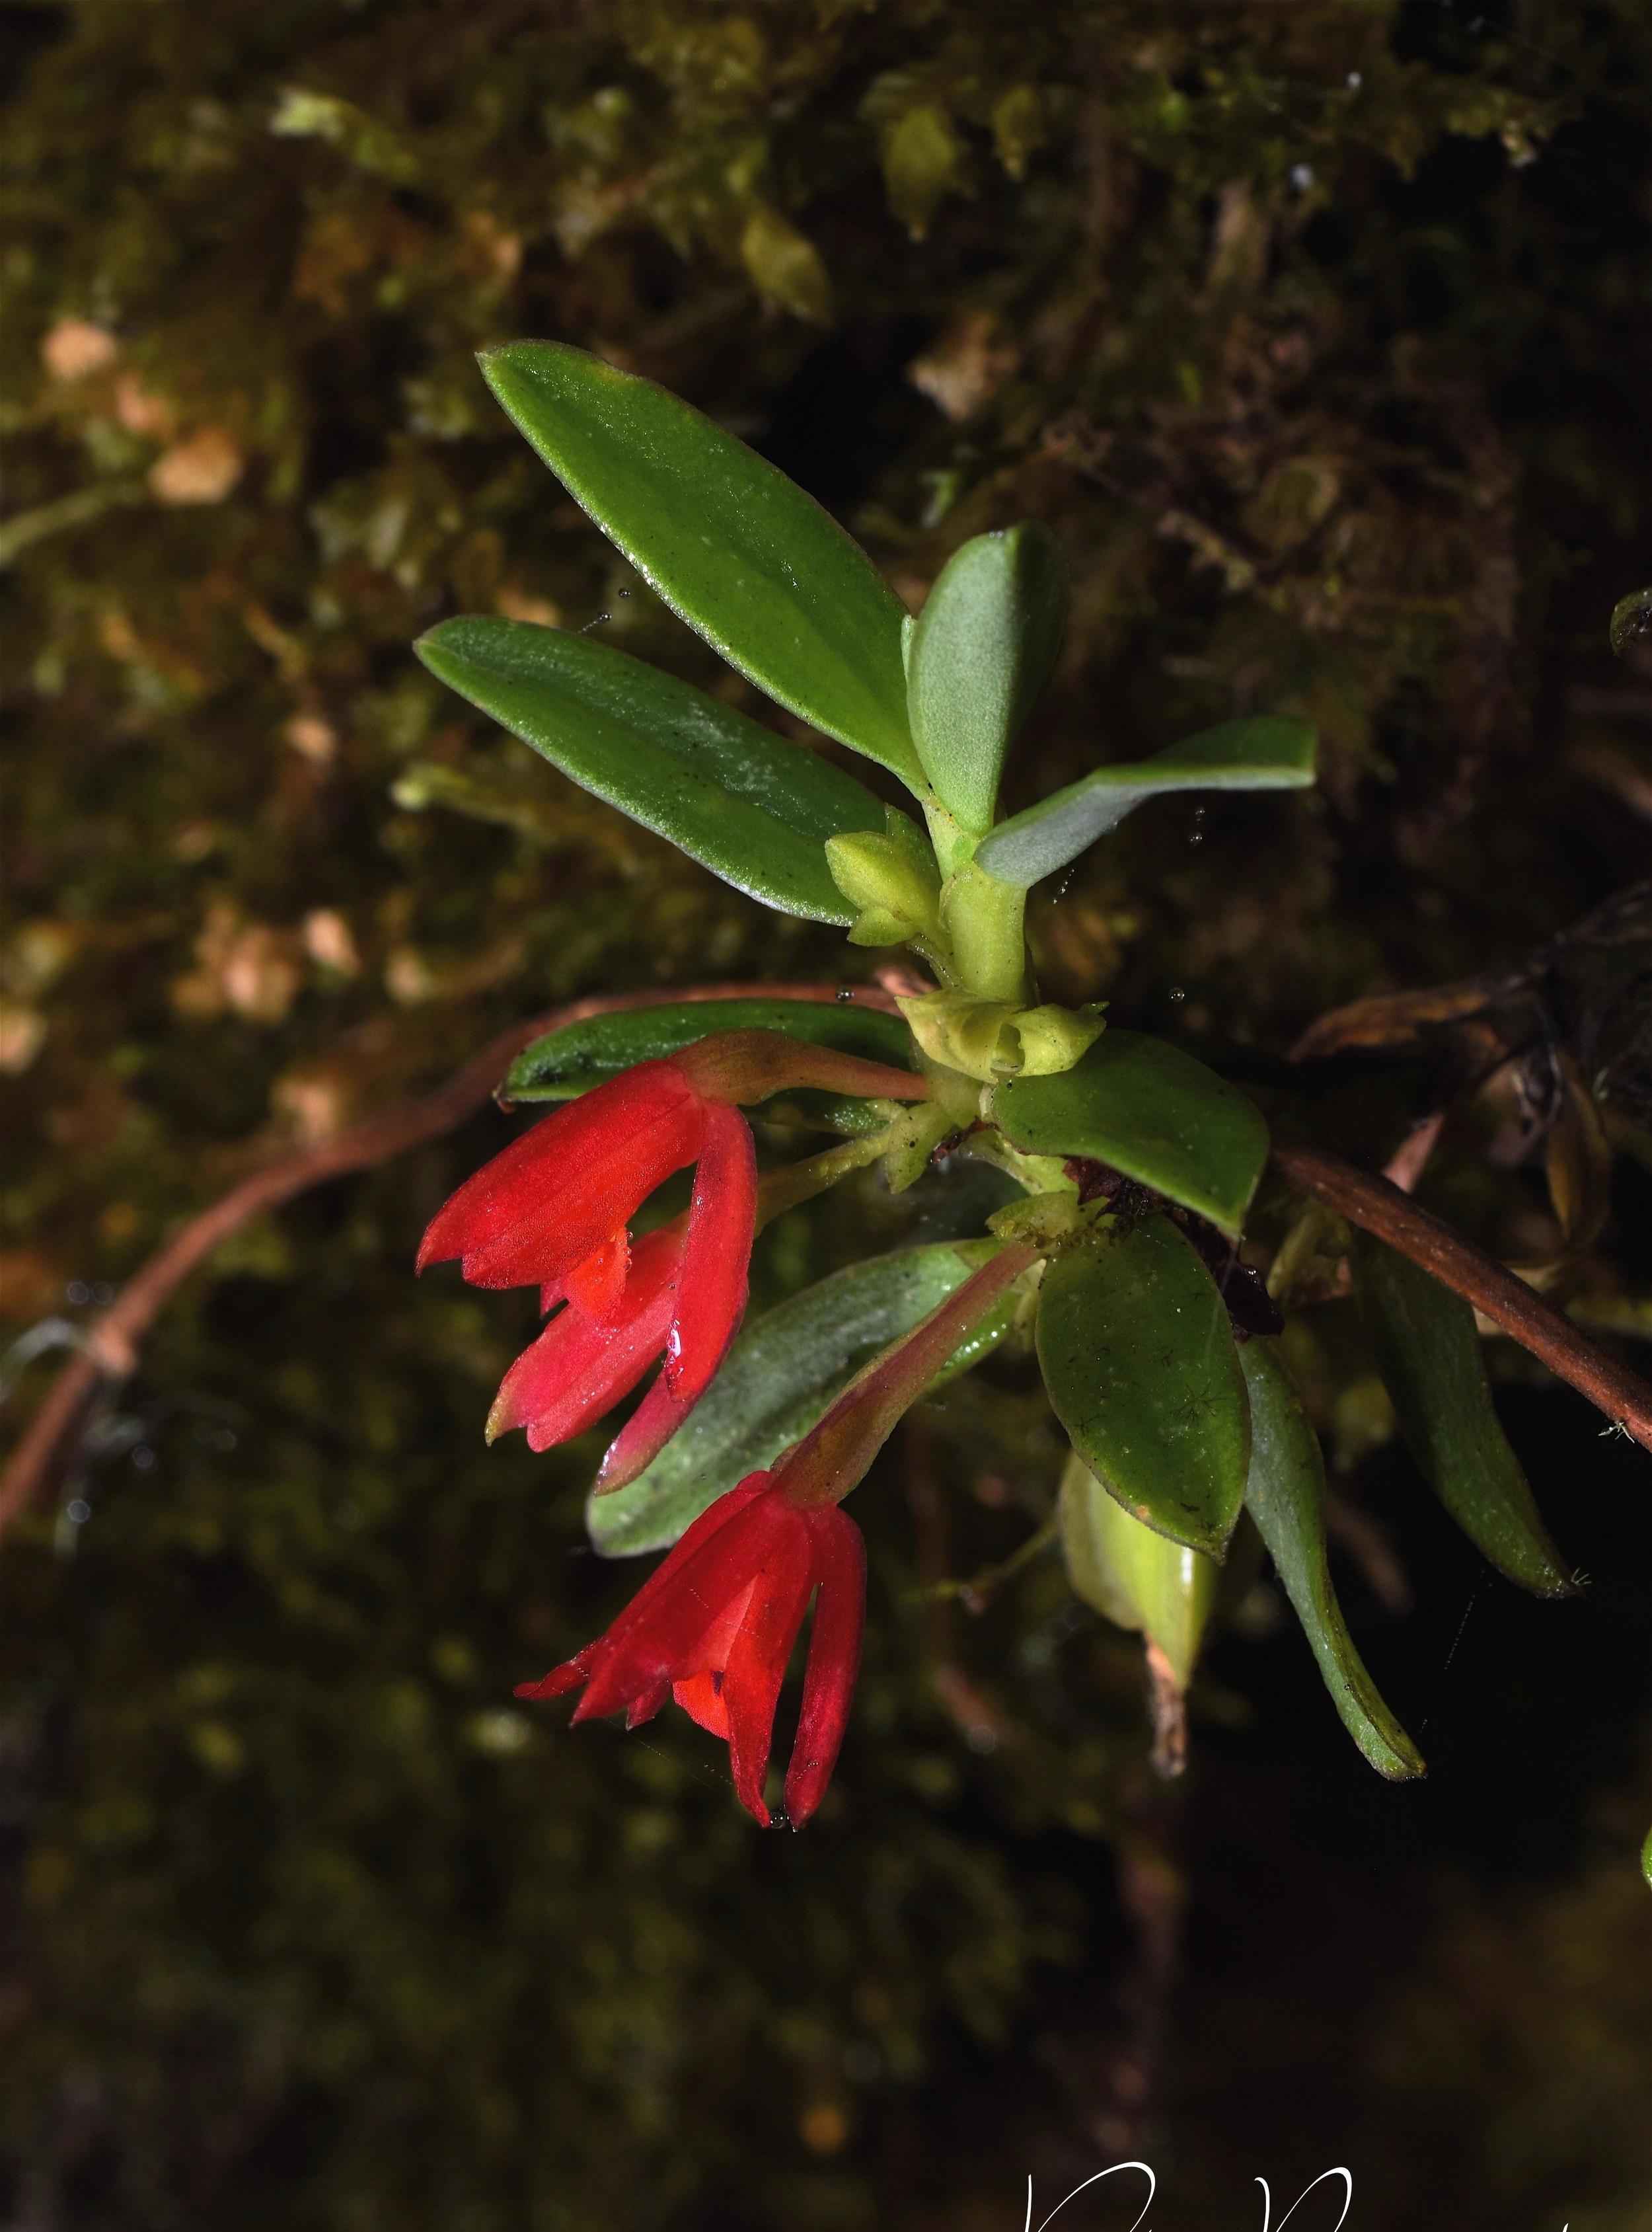 Fernandezia lanceolata